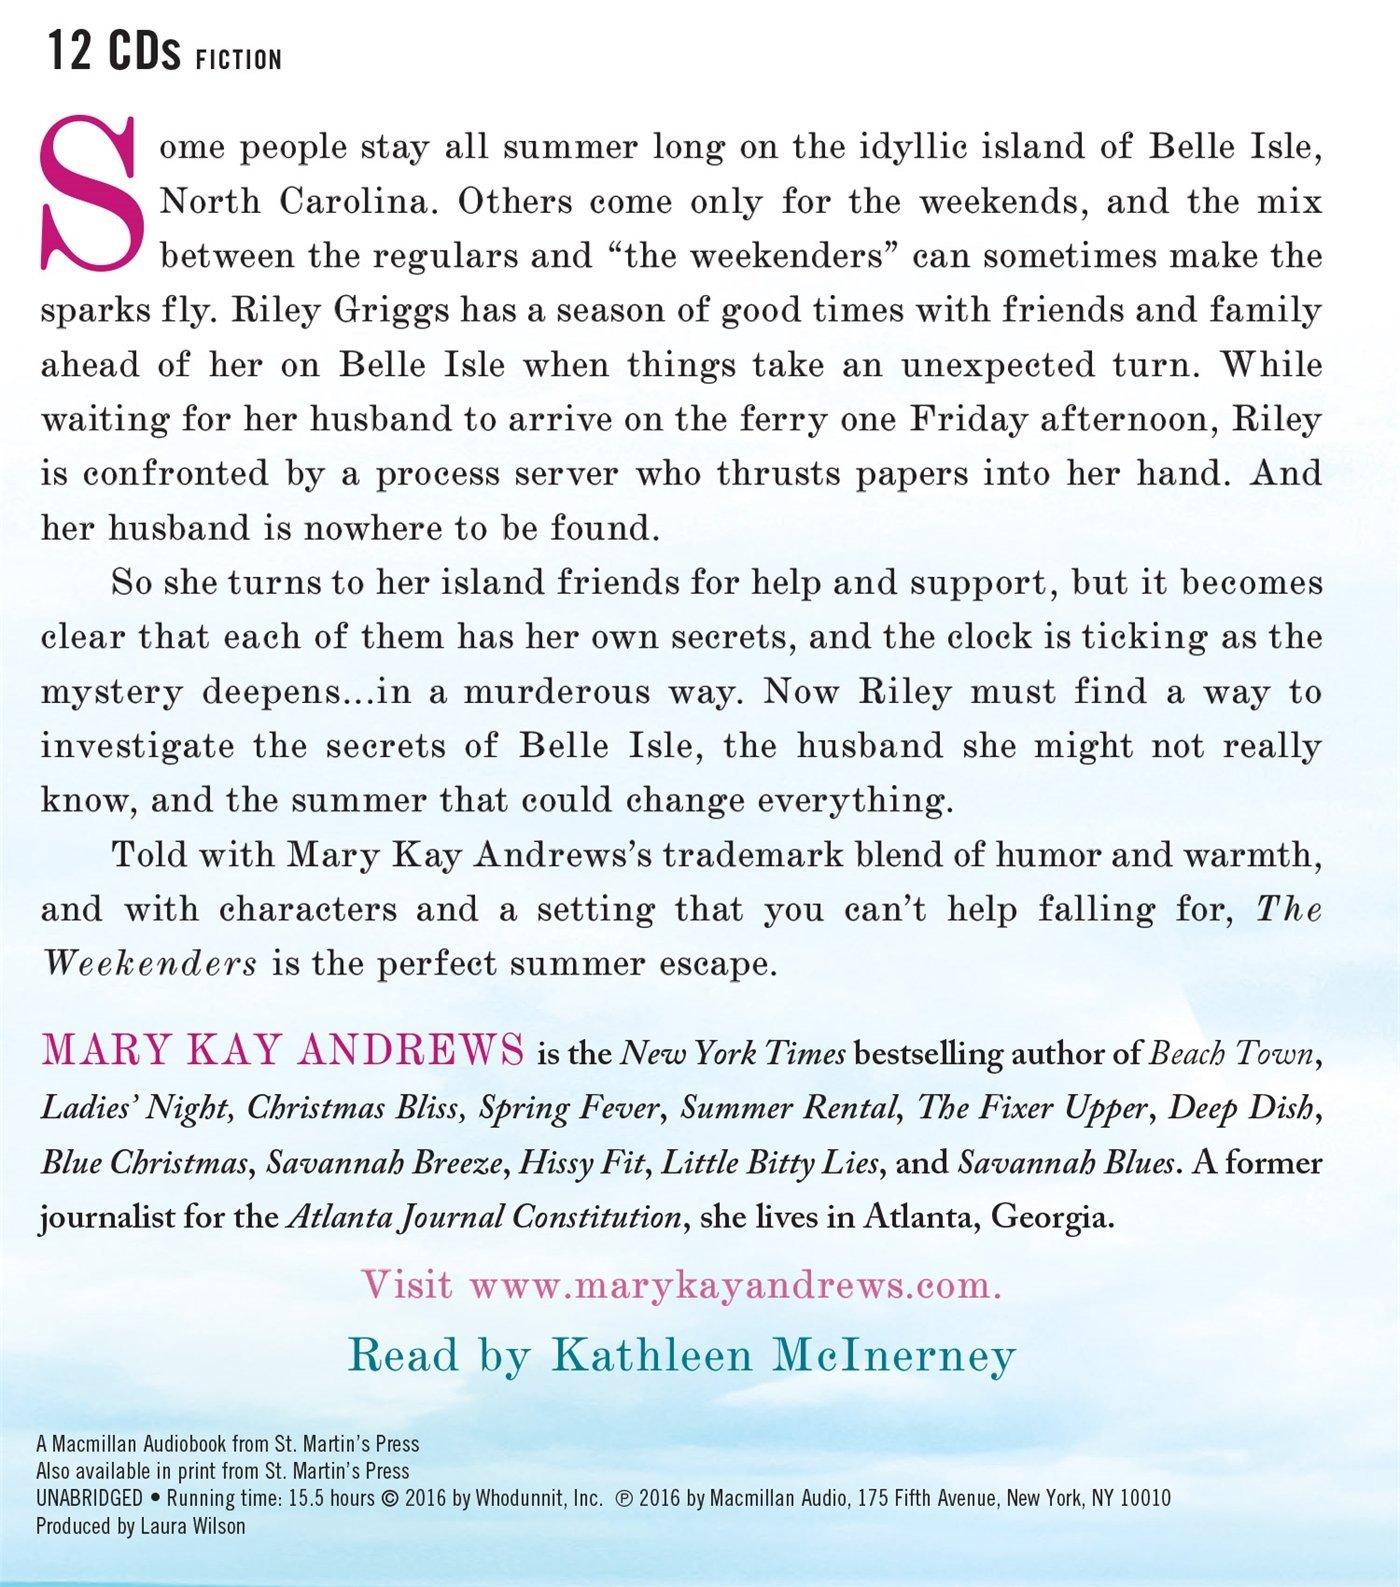 The Weekenders: A Novel: Mary Kay Andrews, Kathleen Mcinerney:  9781427272270: Amazon: Books